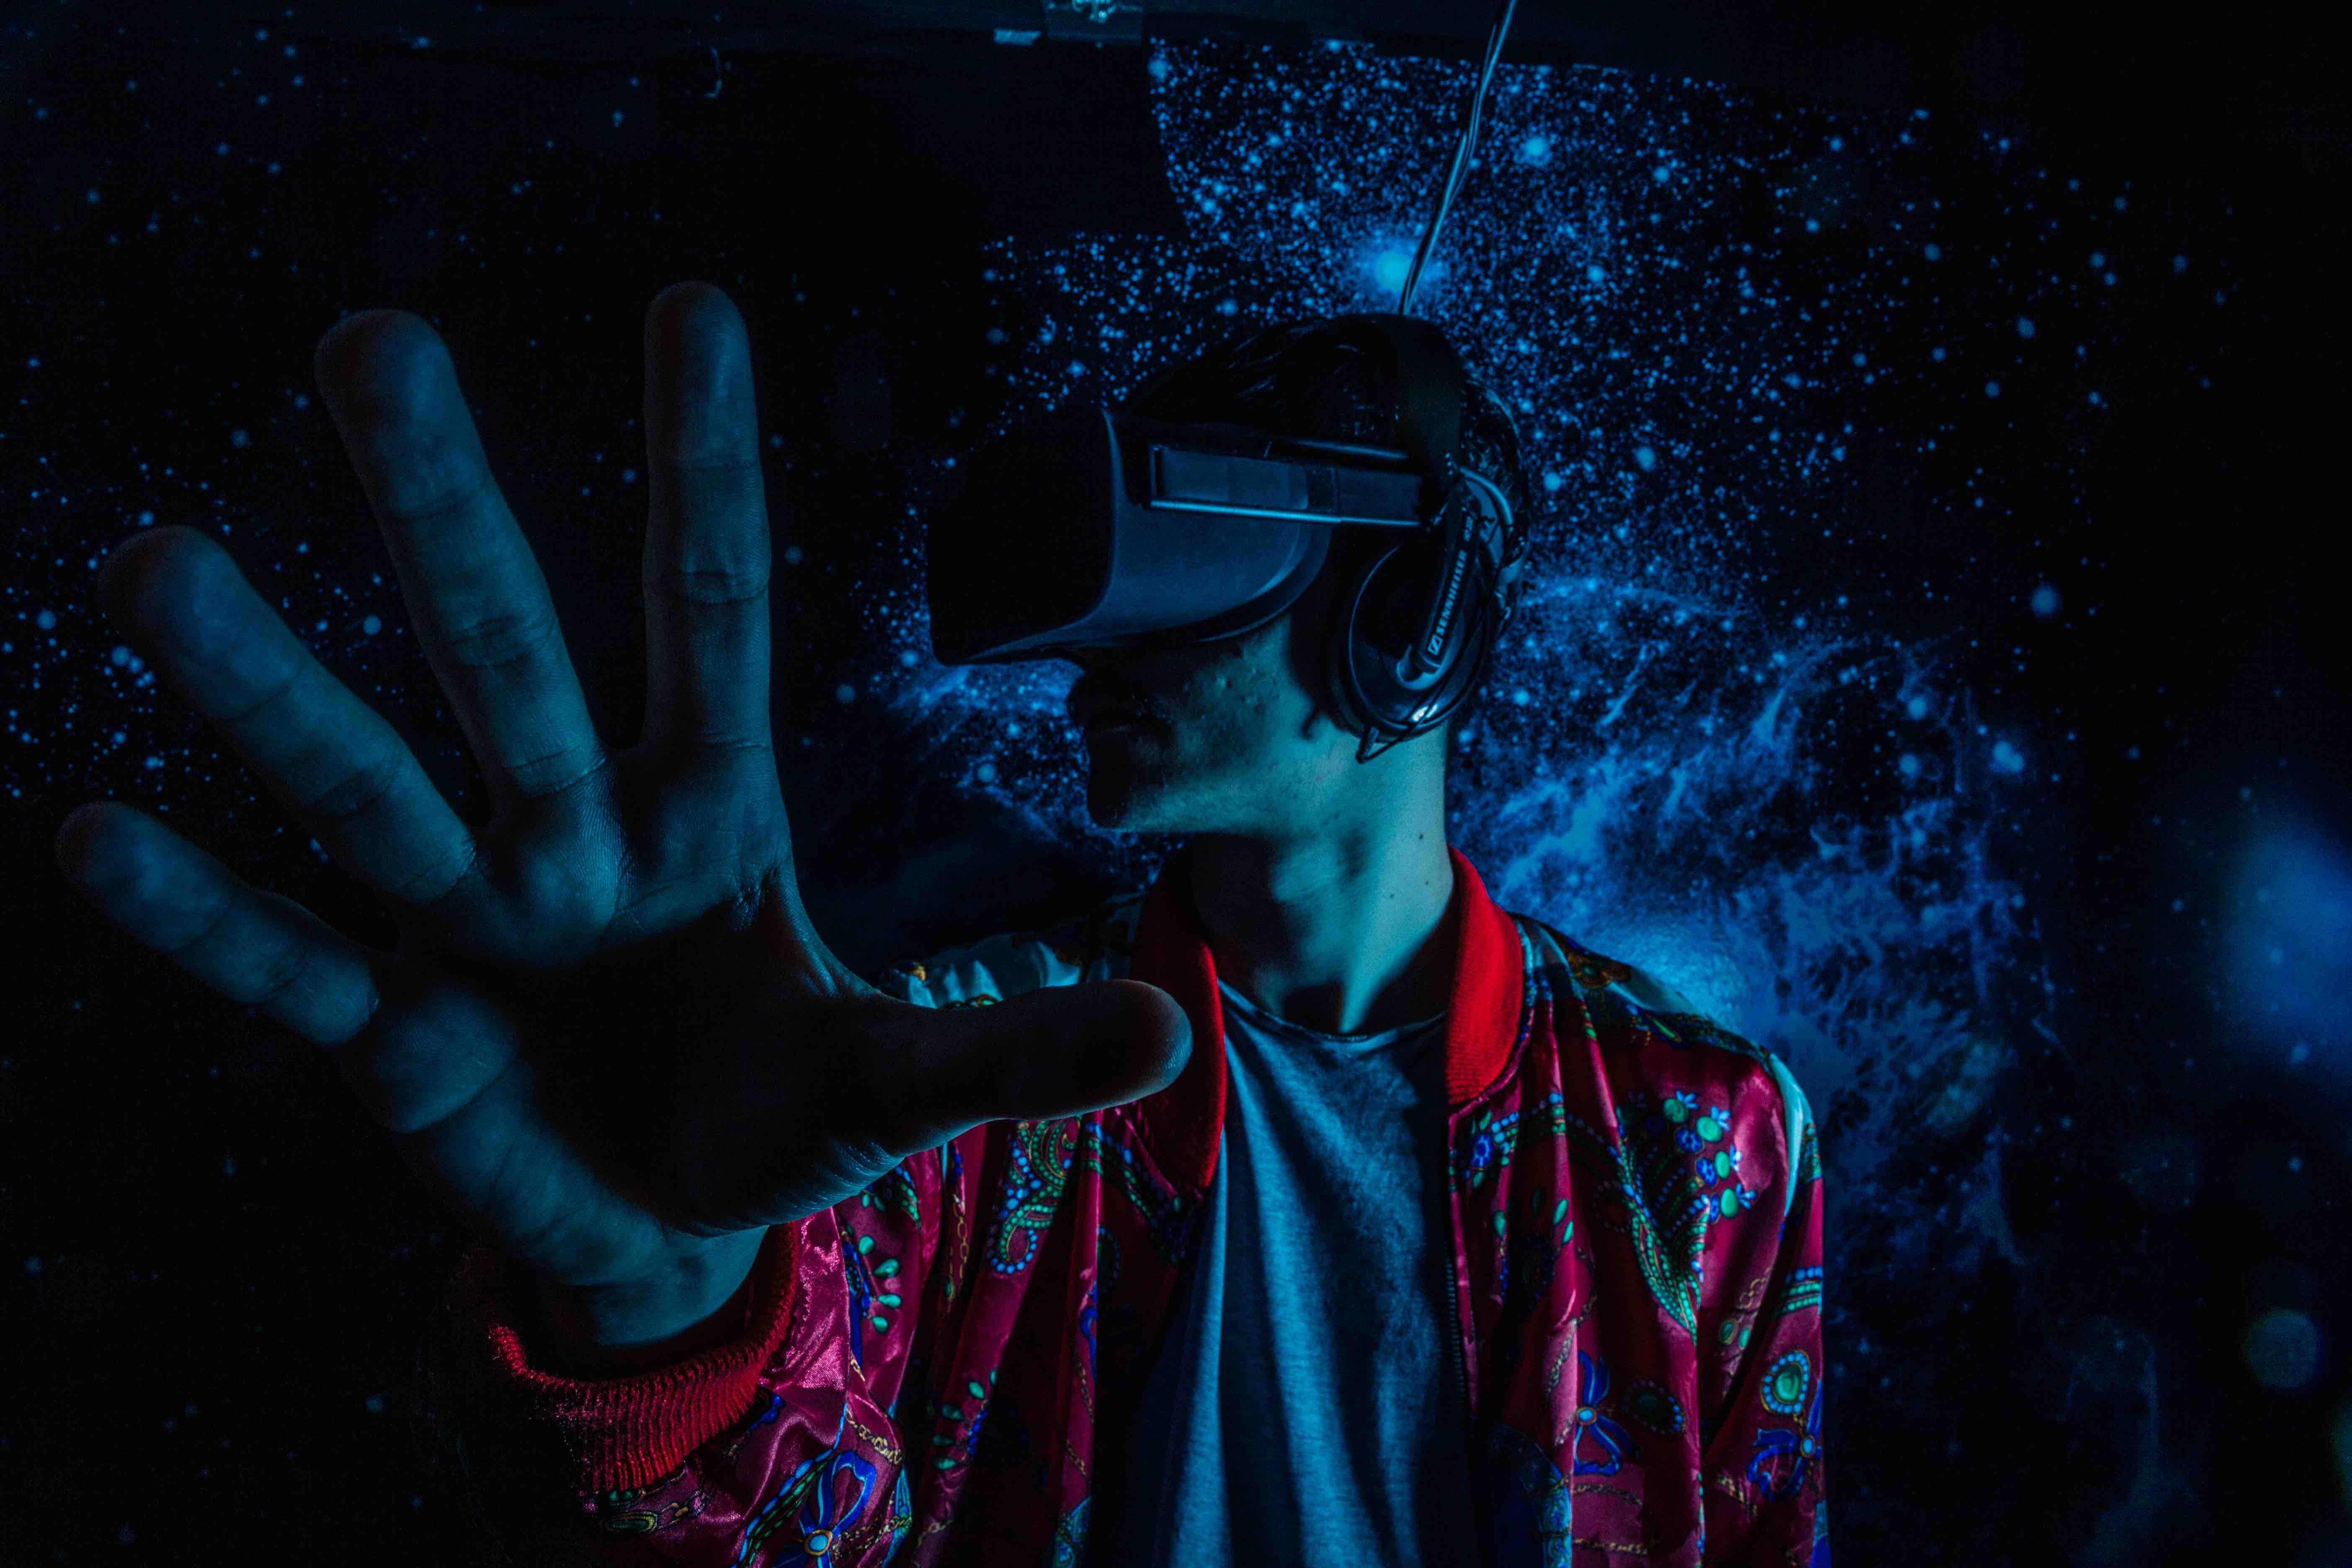 Realidad Virtual en Argentina - Virtual reality - Matias Cardozo - VR - RV - Oculus Rift Argentina